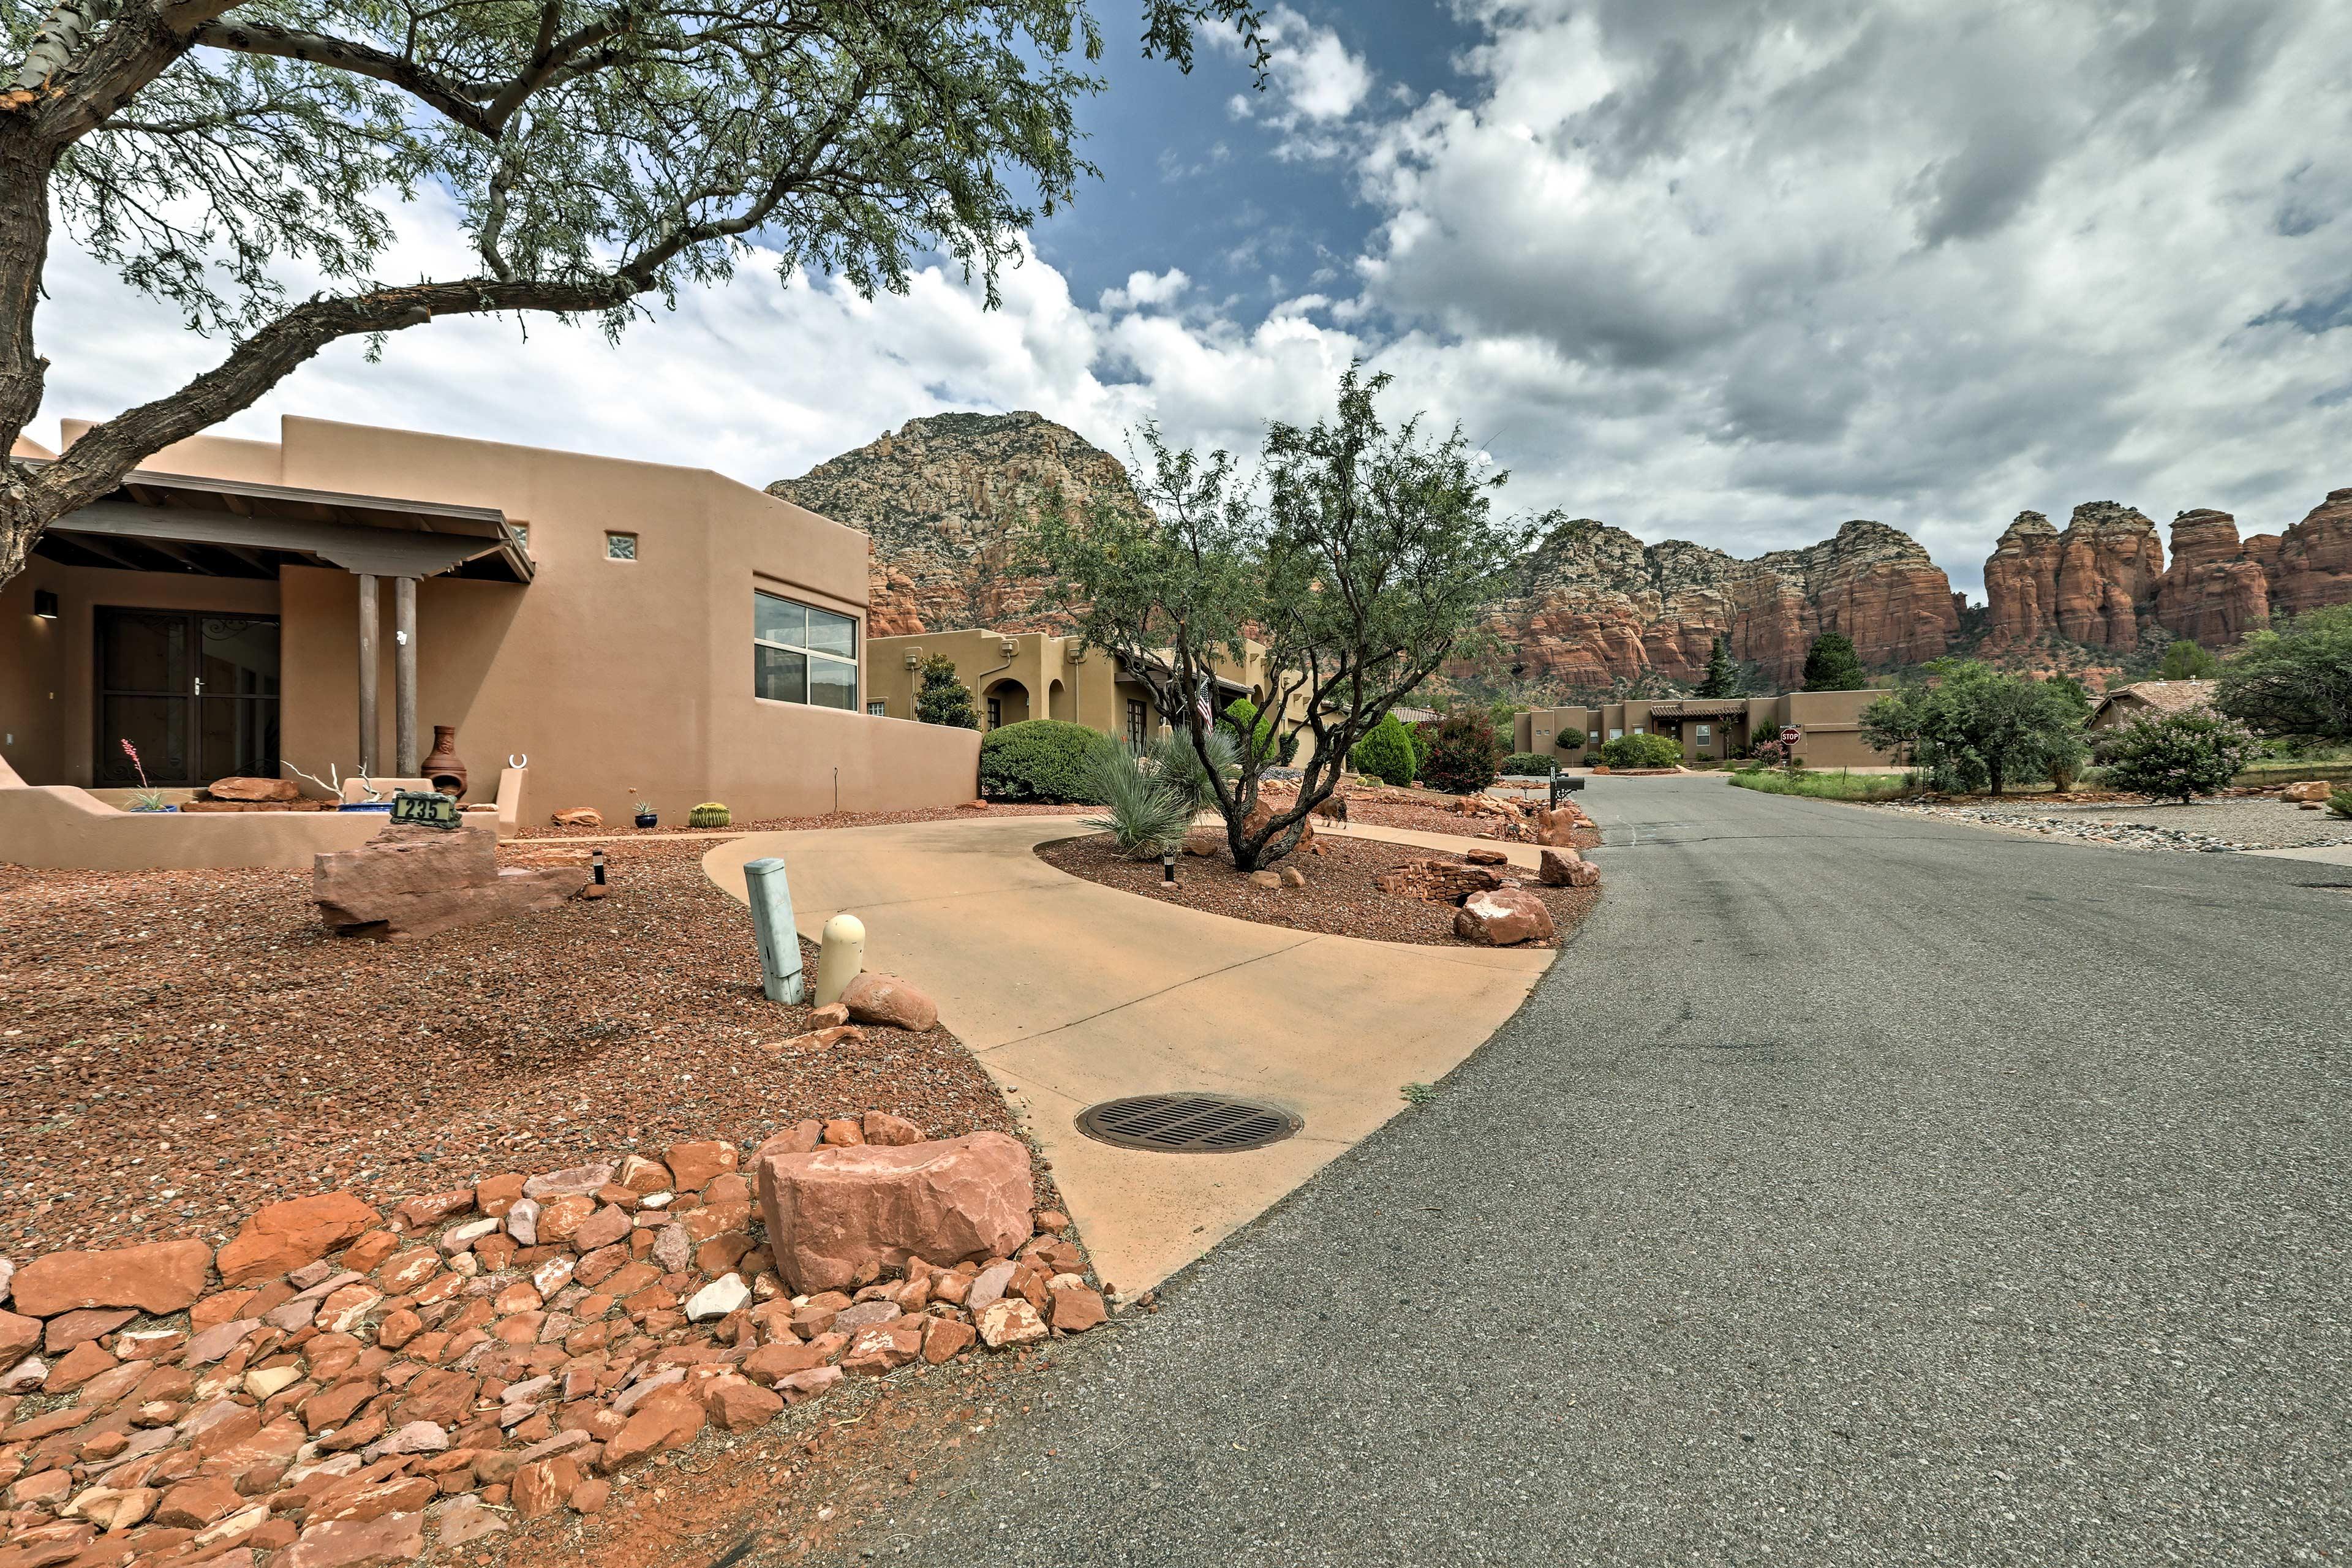 Impressive views surround this classic adobe home.